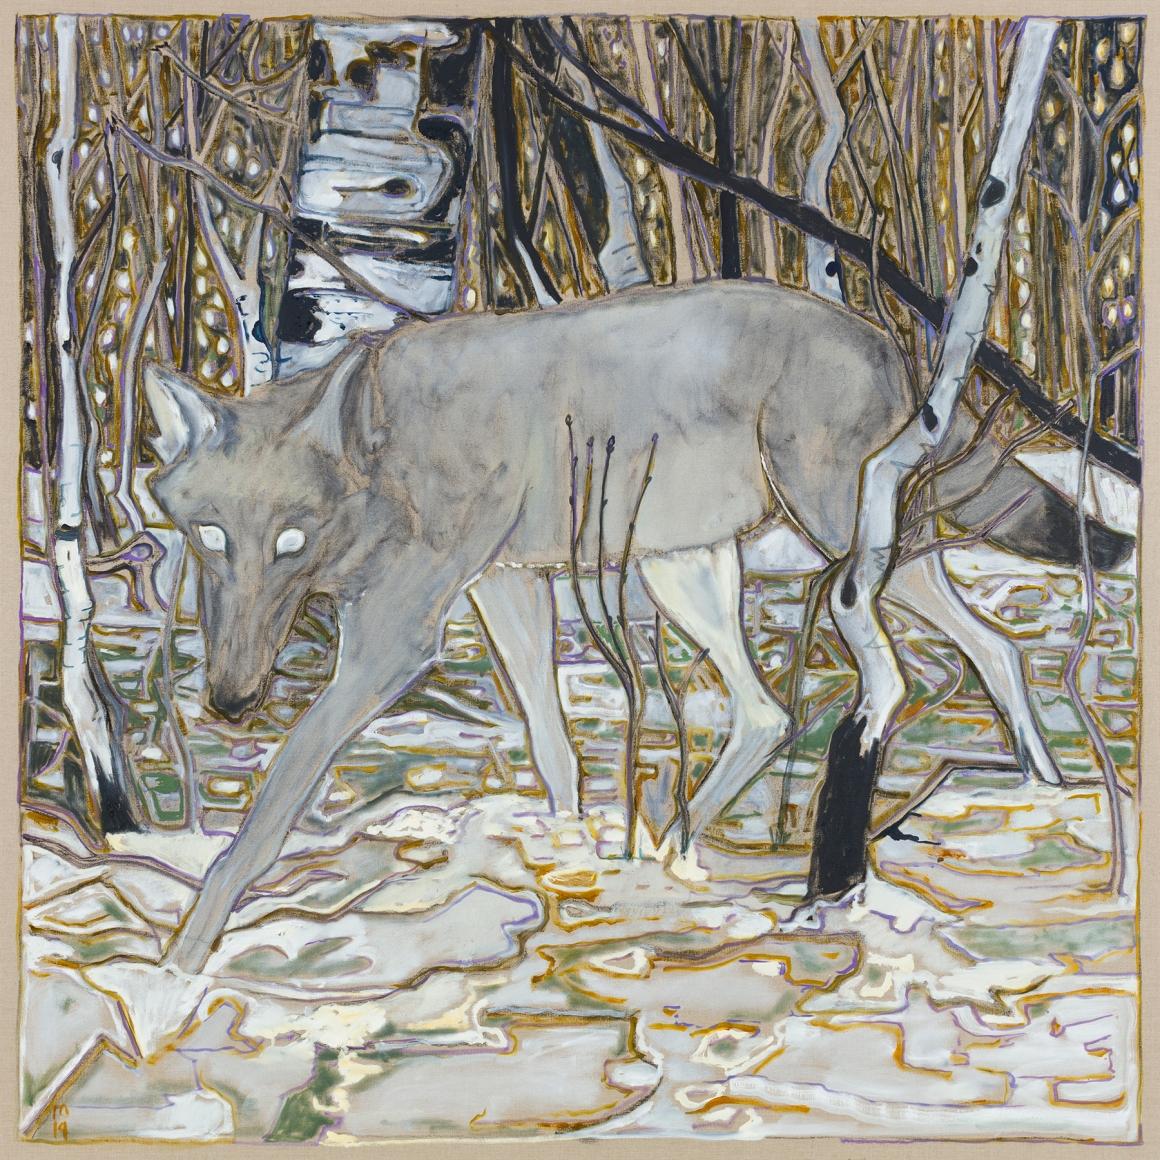 BILLY CHILDISH, wolf in birch trees, 2019